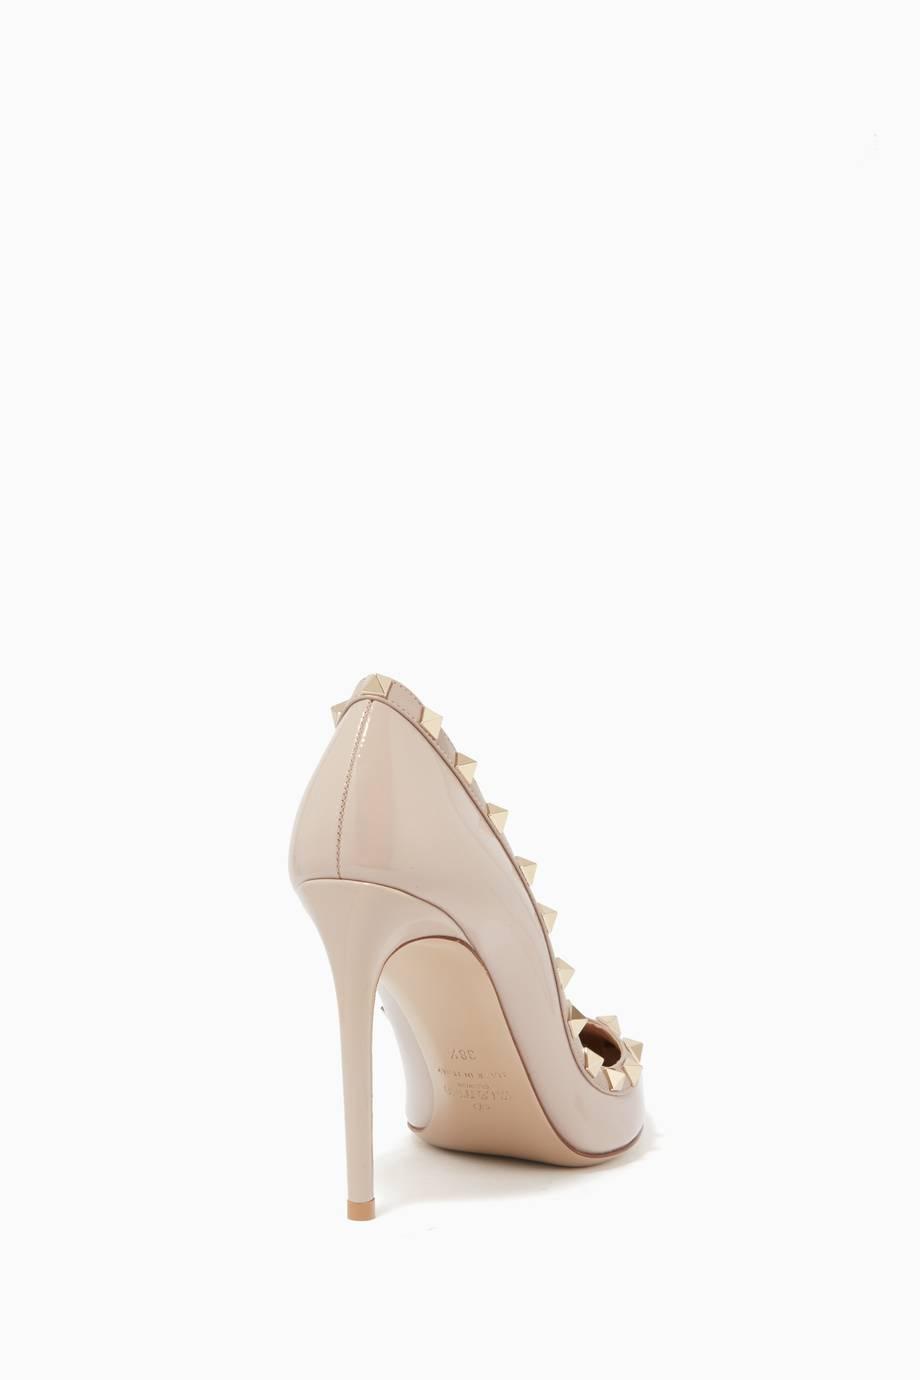 ce8e5fbb9ba61 تسوق حذاء كعب عالي روكستد جلد لامع لونين بودر من فالنتينو